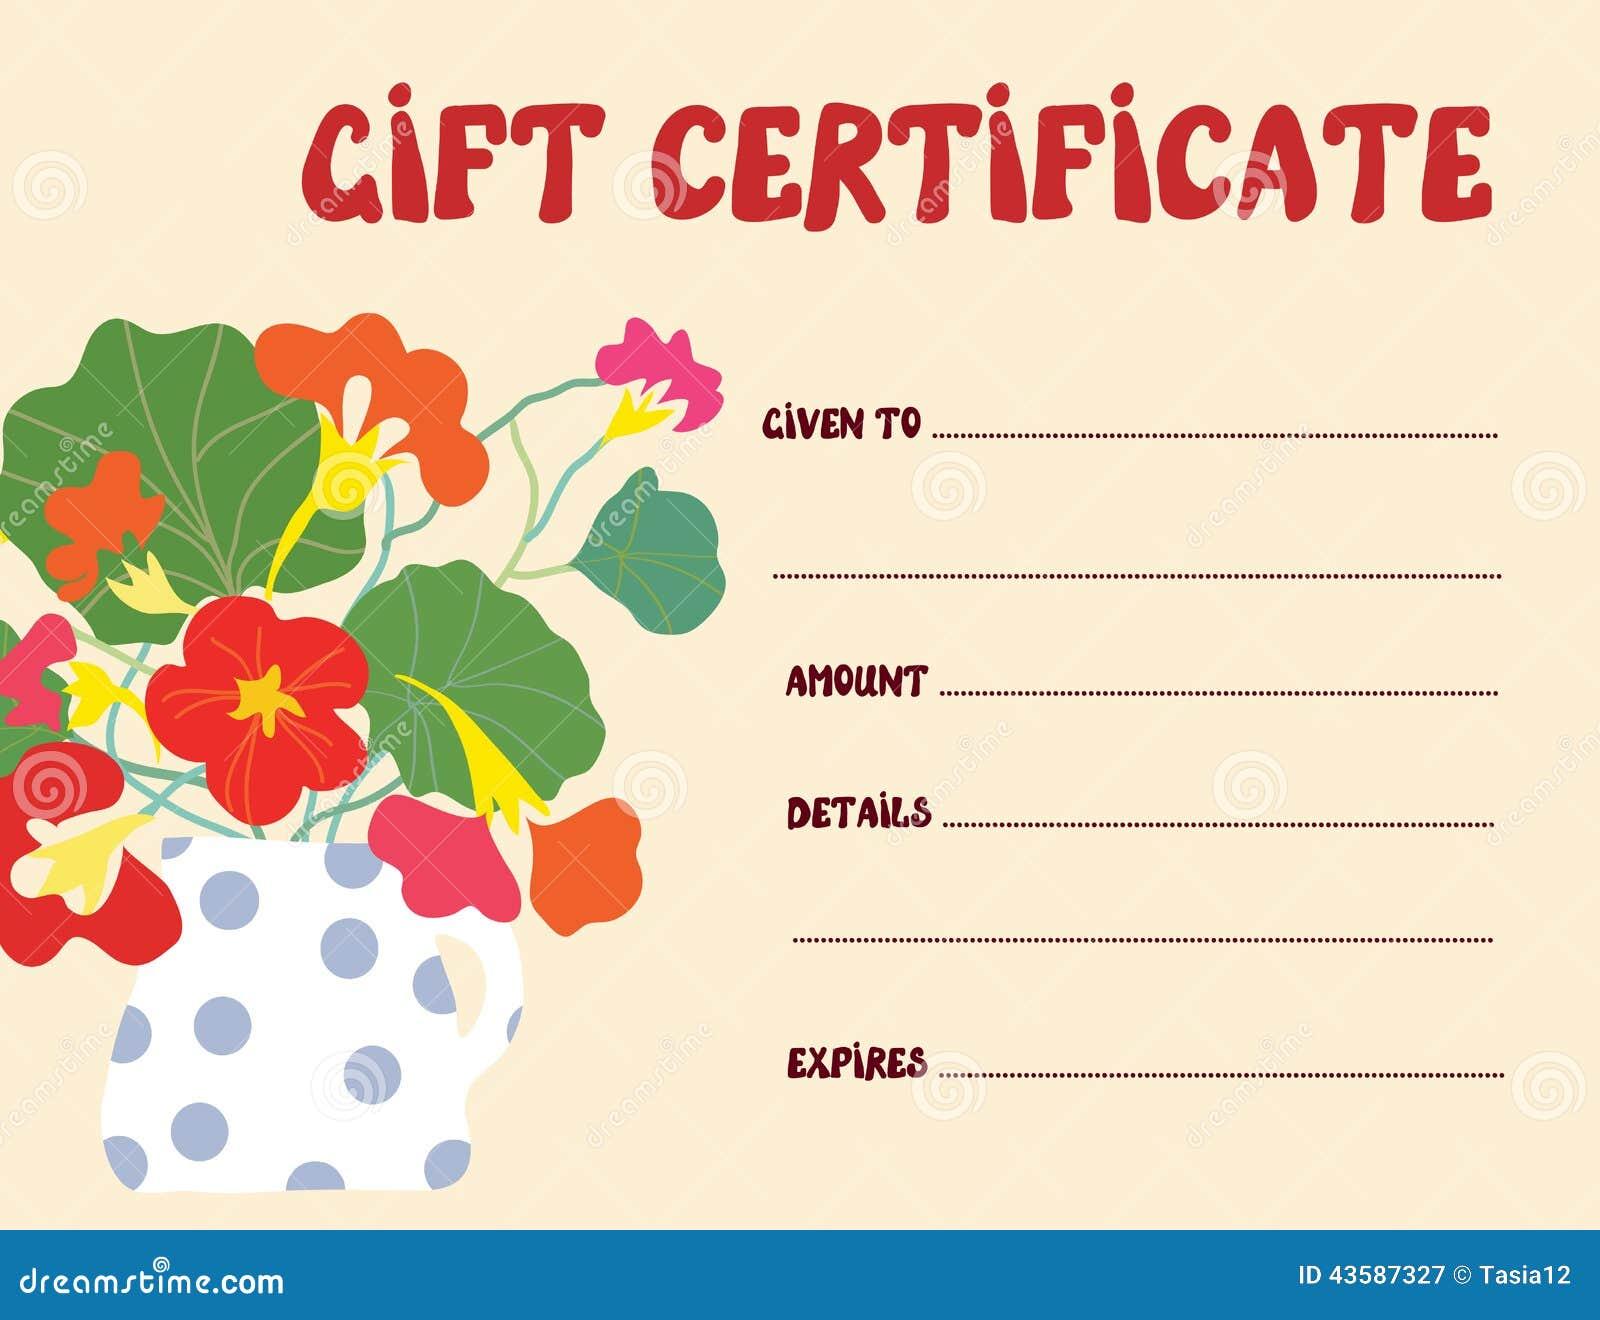 fun gift certificate template